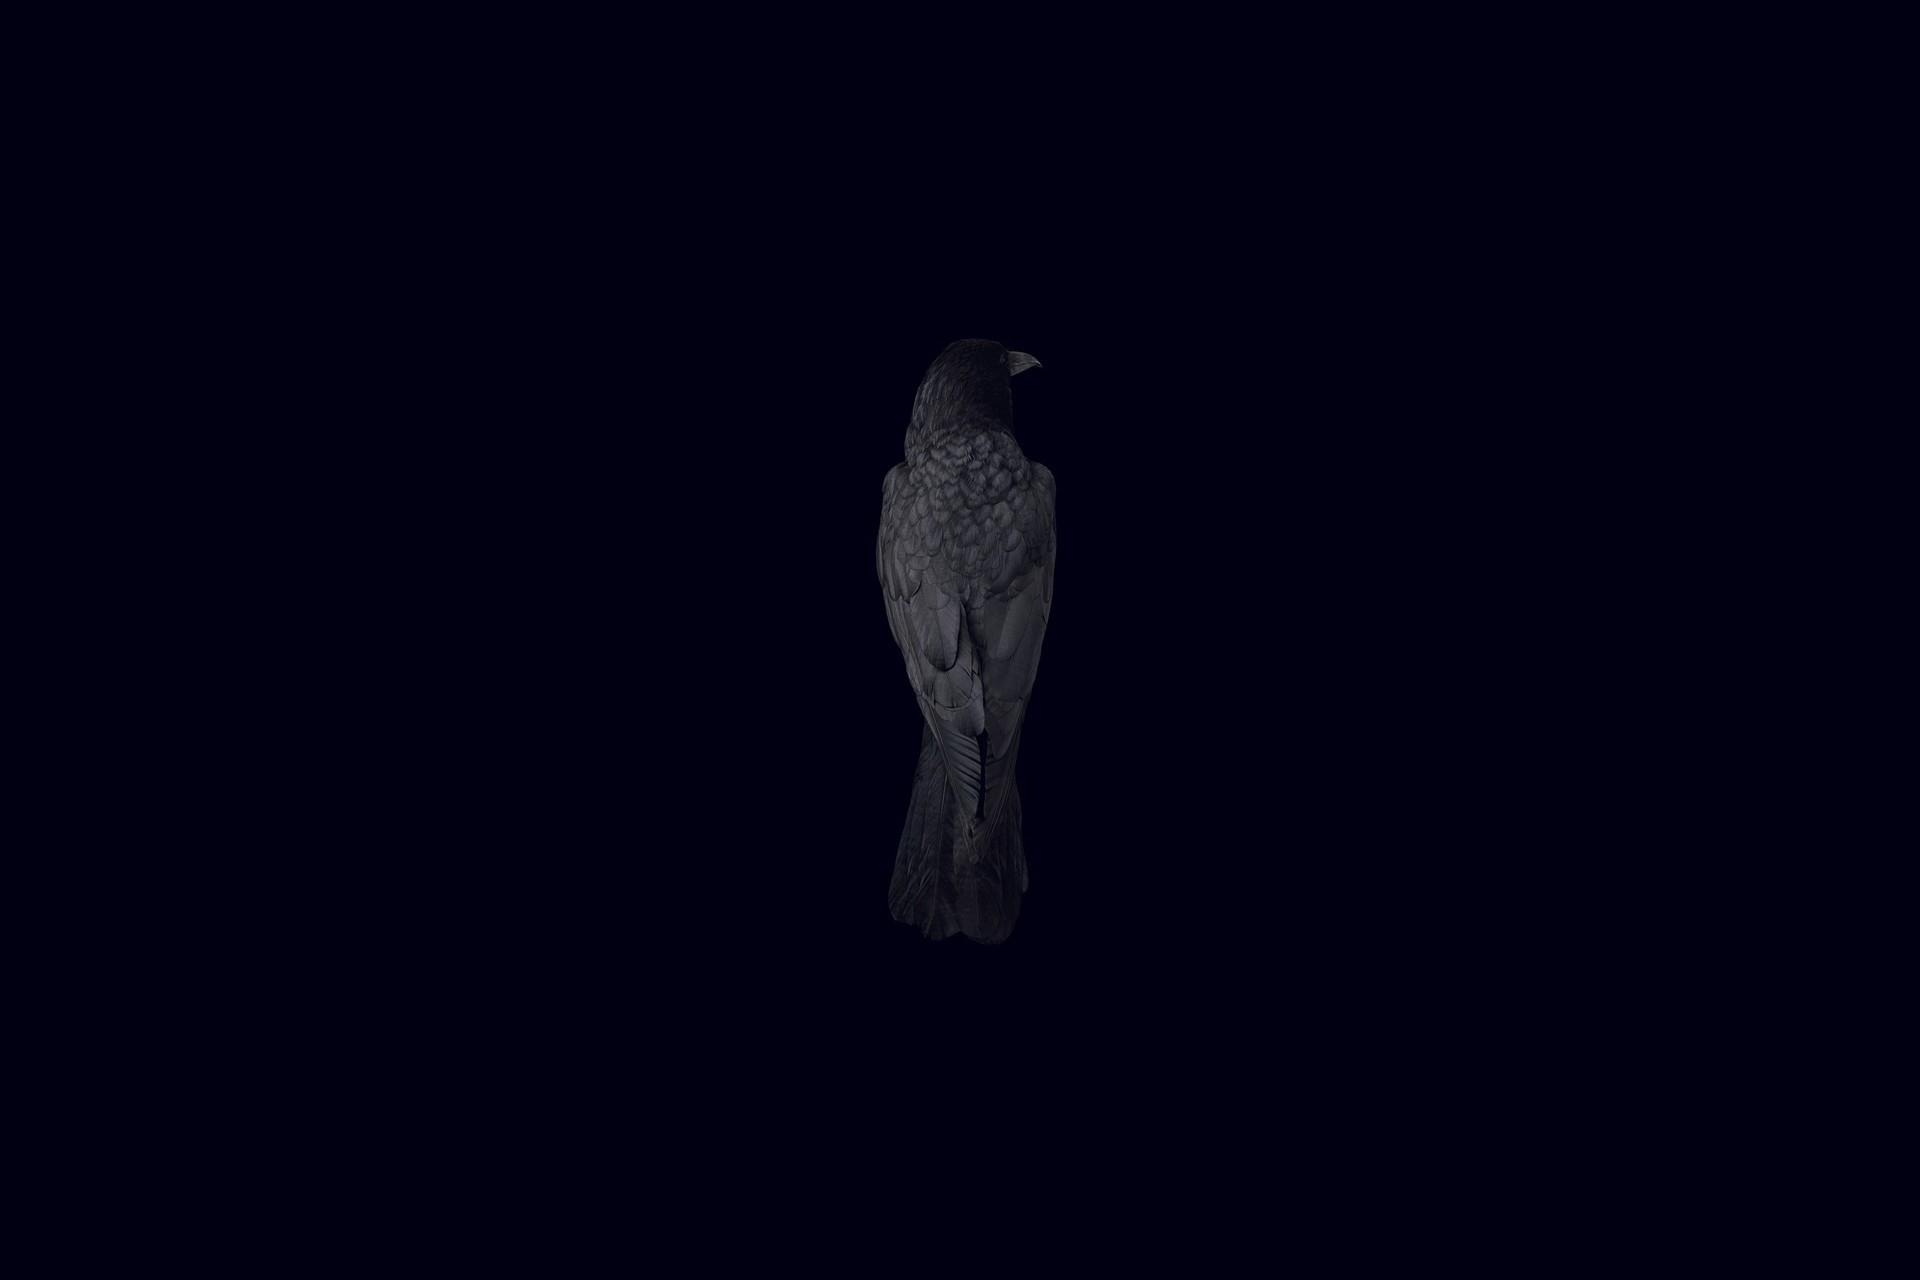 Wallpaper black background bird raven wallpapers minimalism 1920x1280